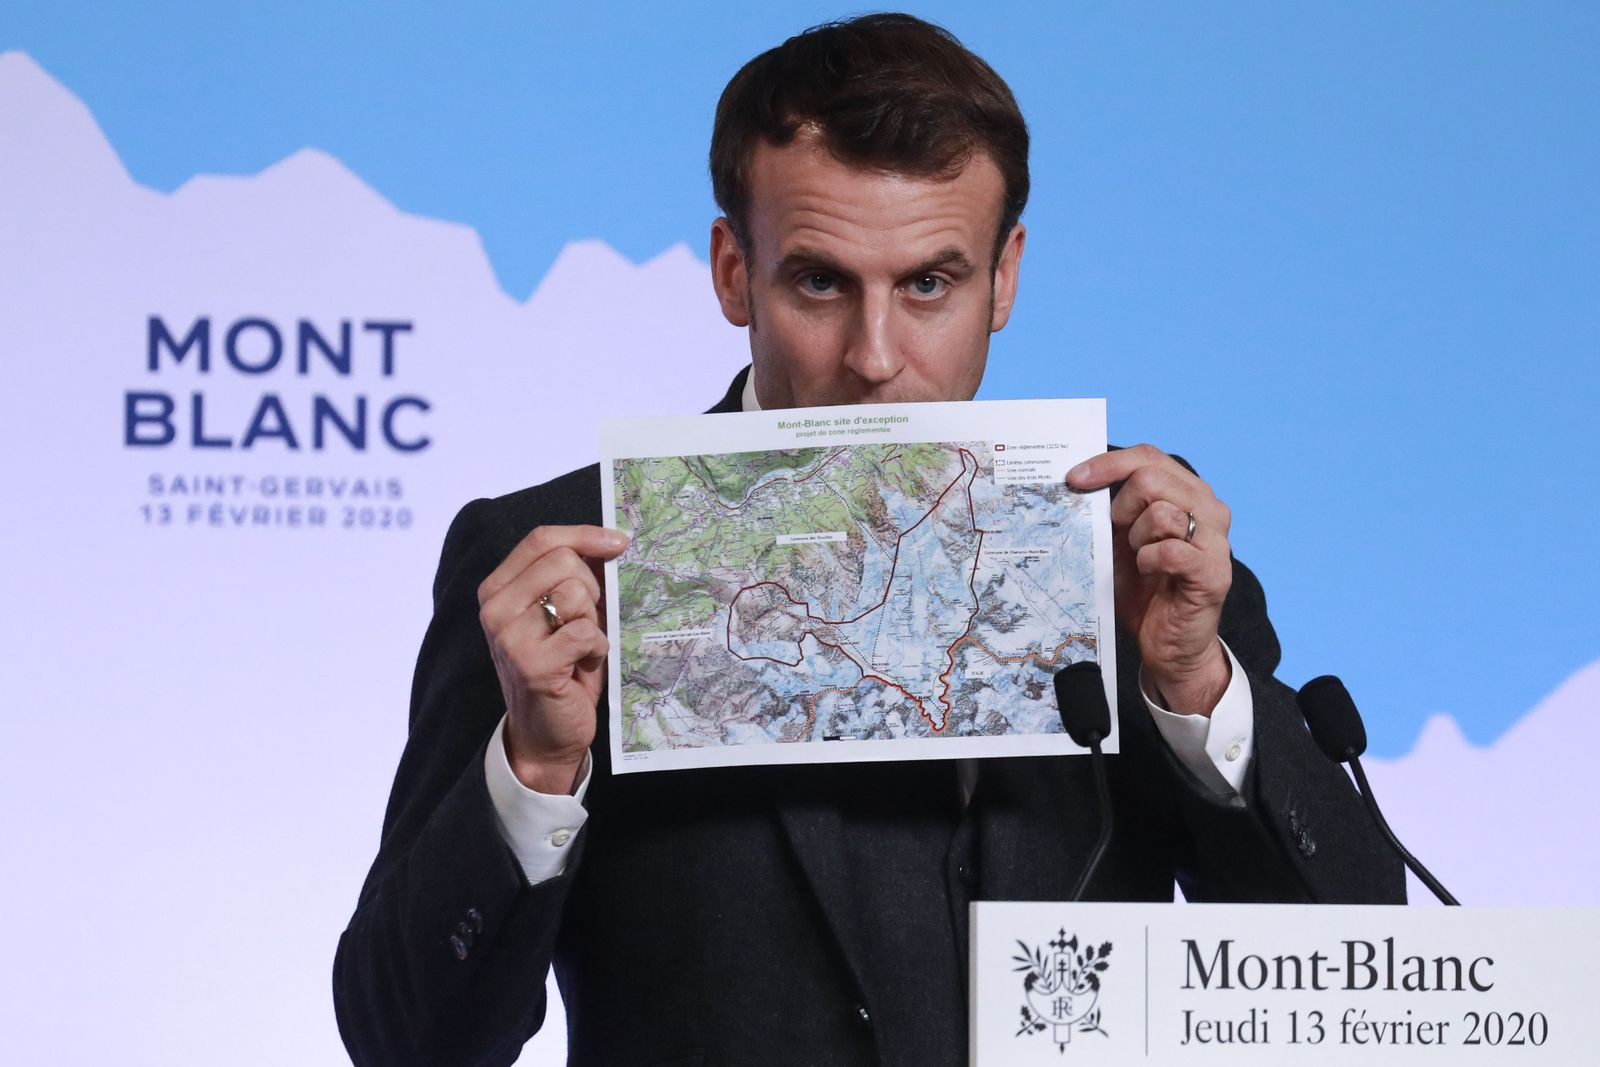 FILES-FRANCE-POLITICS-ENVIRONMENT-CLIMATE